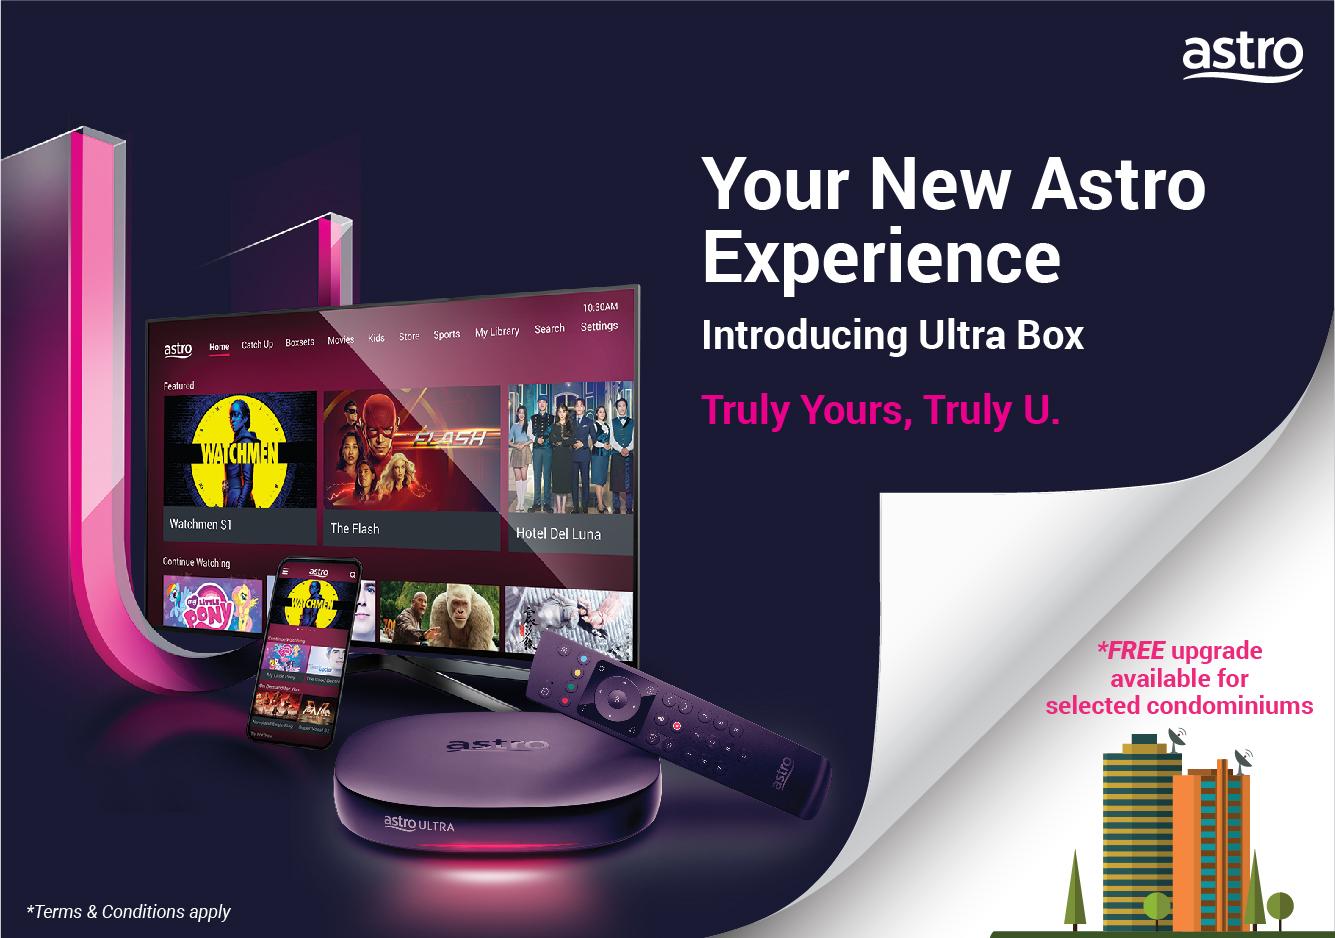 Condominium Residents Can Now Enjoy 4k Uhd On Astro Ultra Box